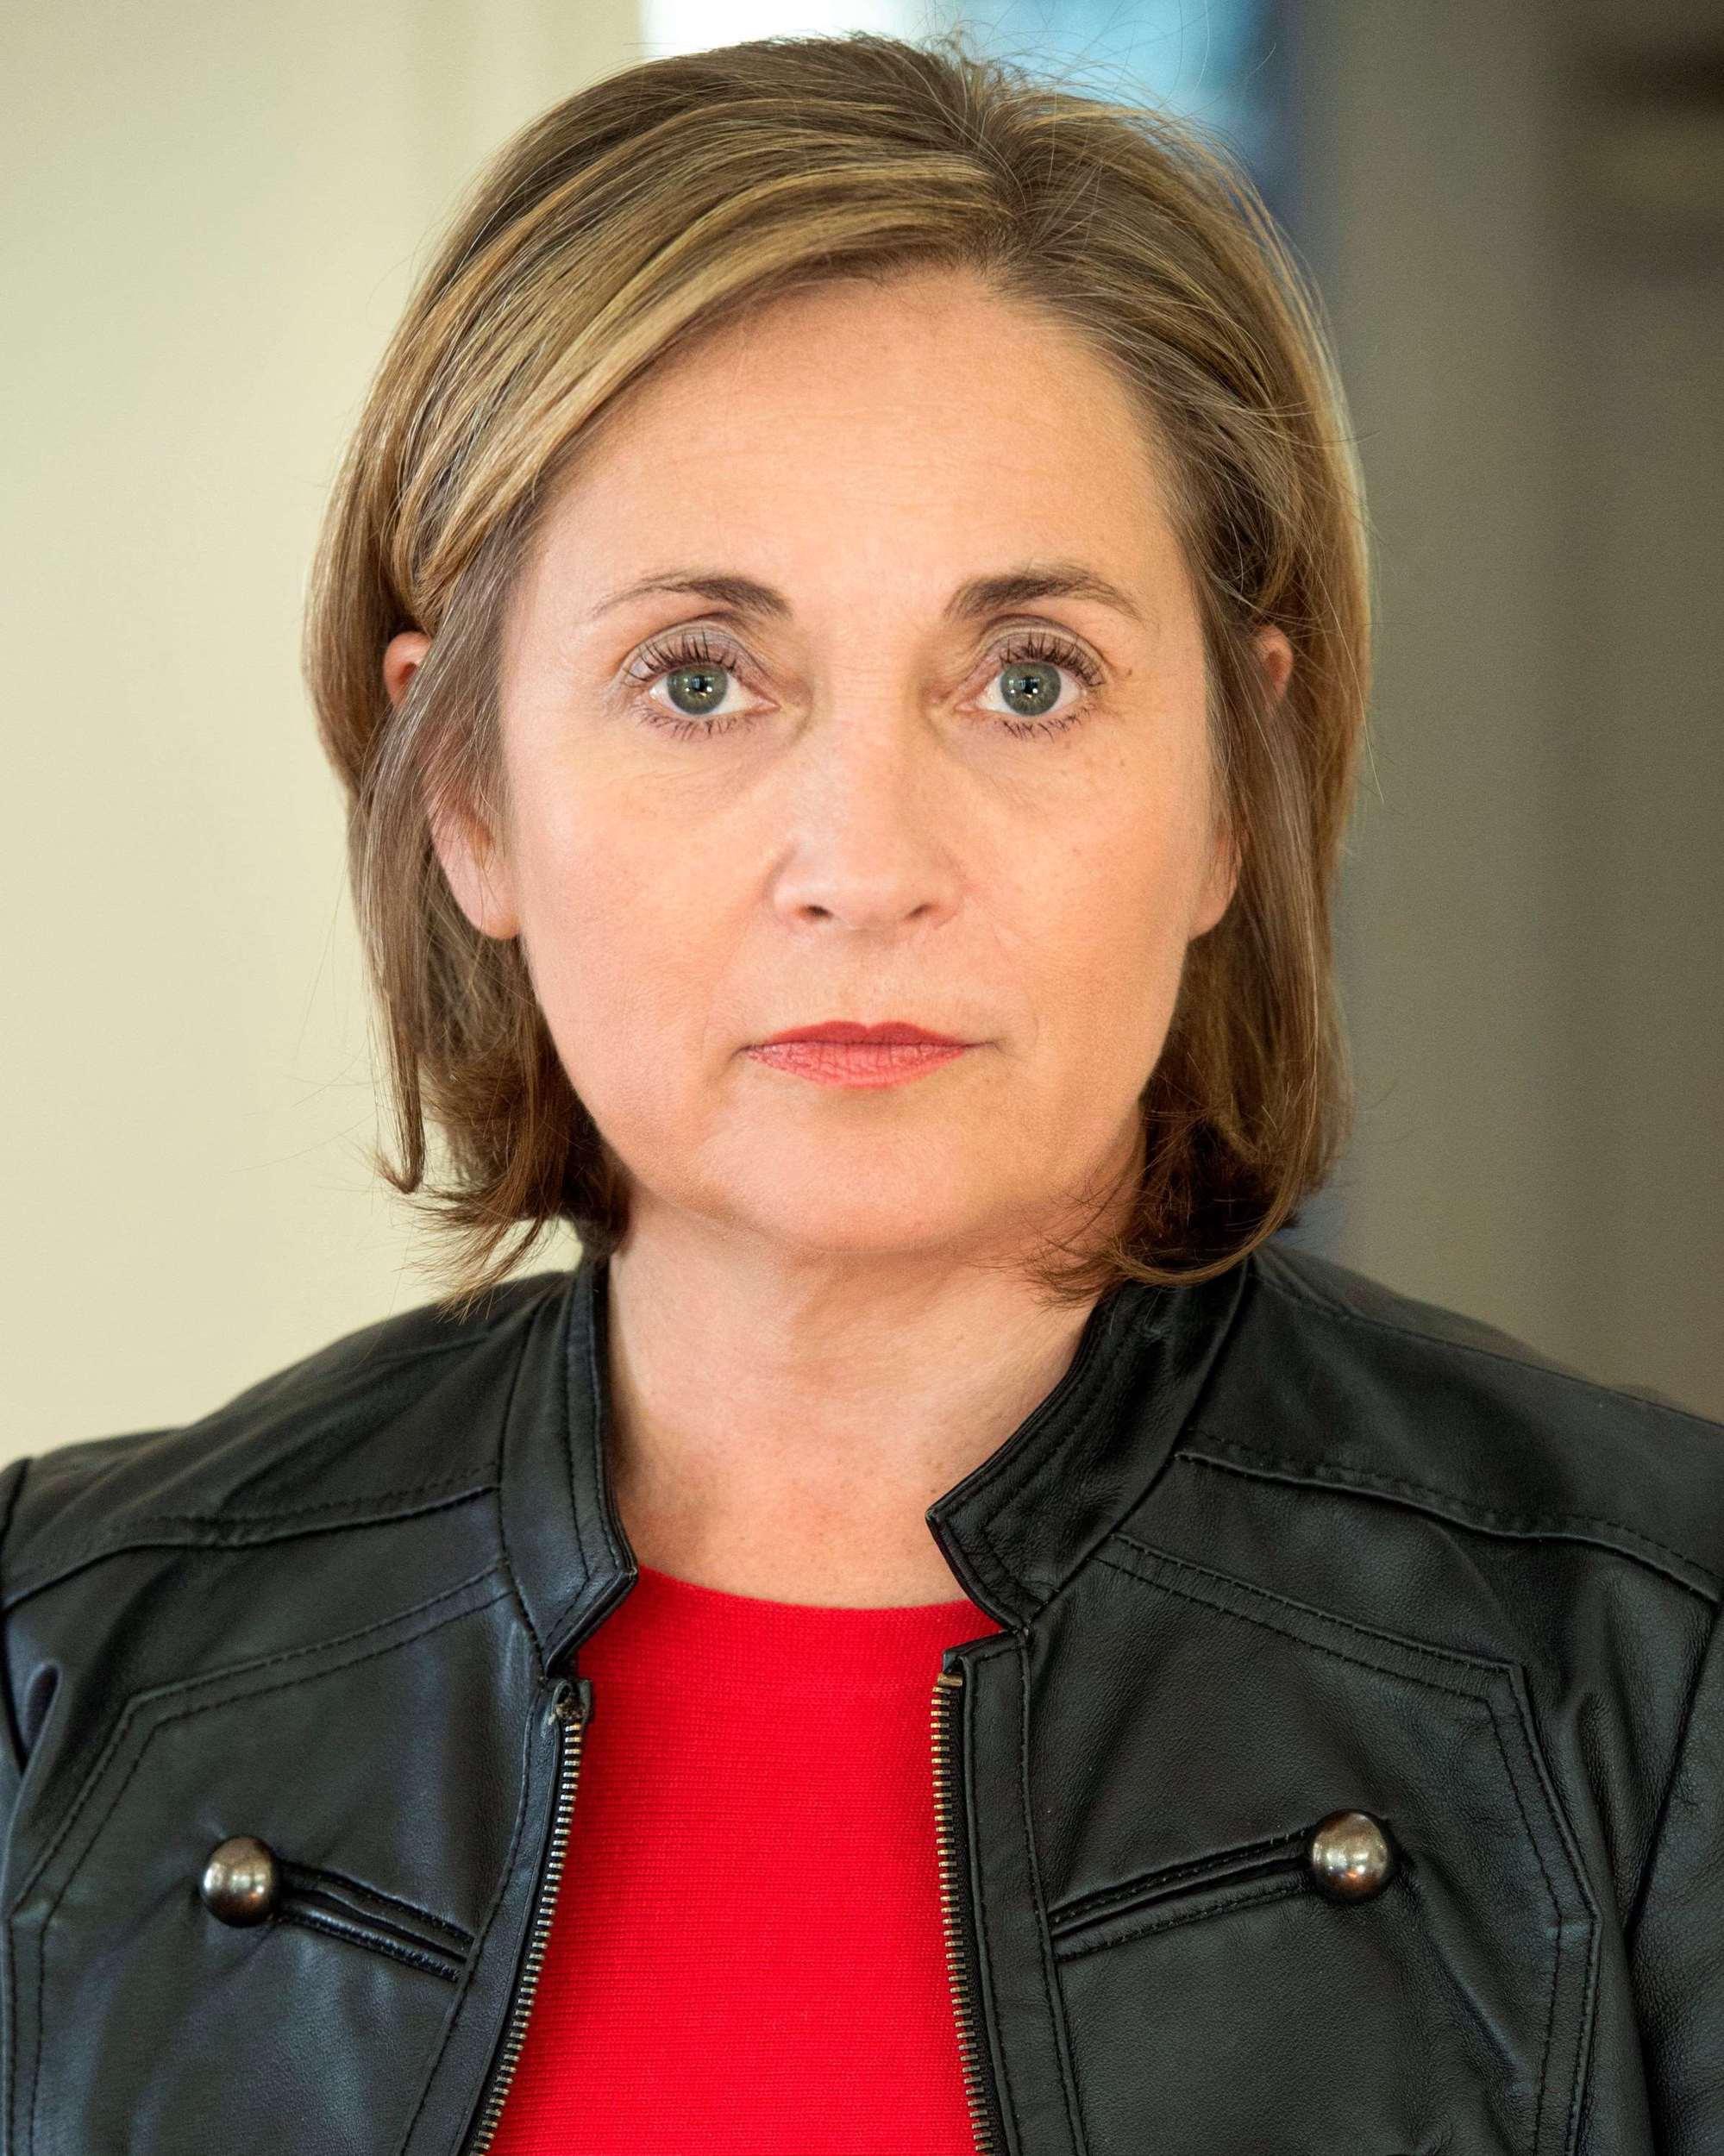 Inga Romantsova